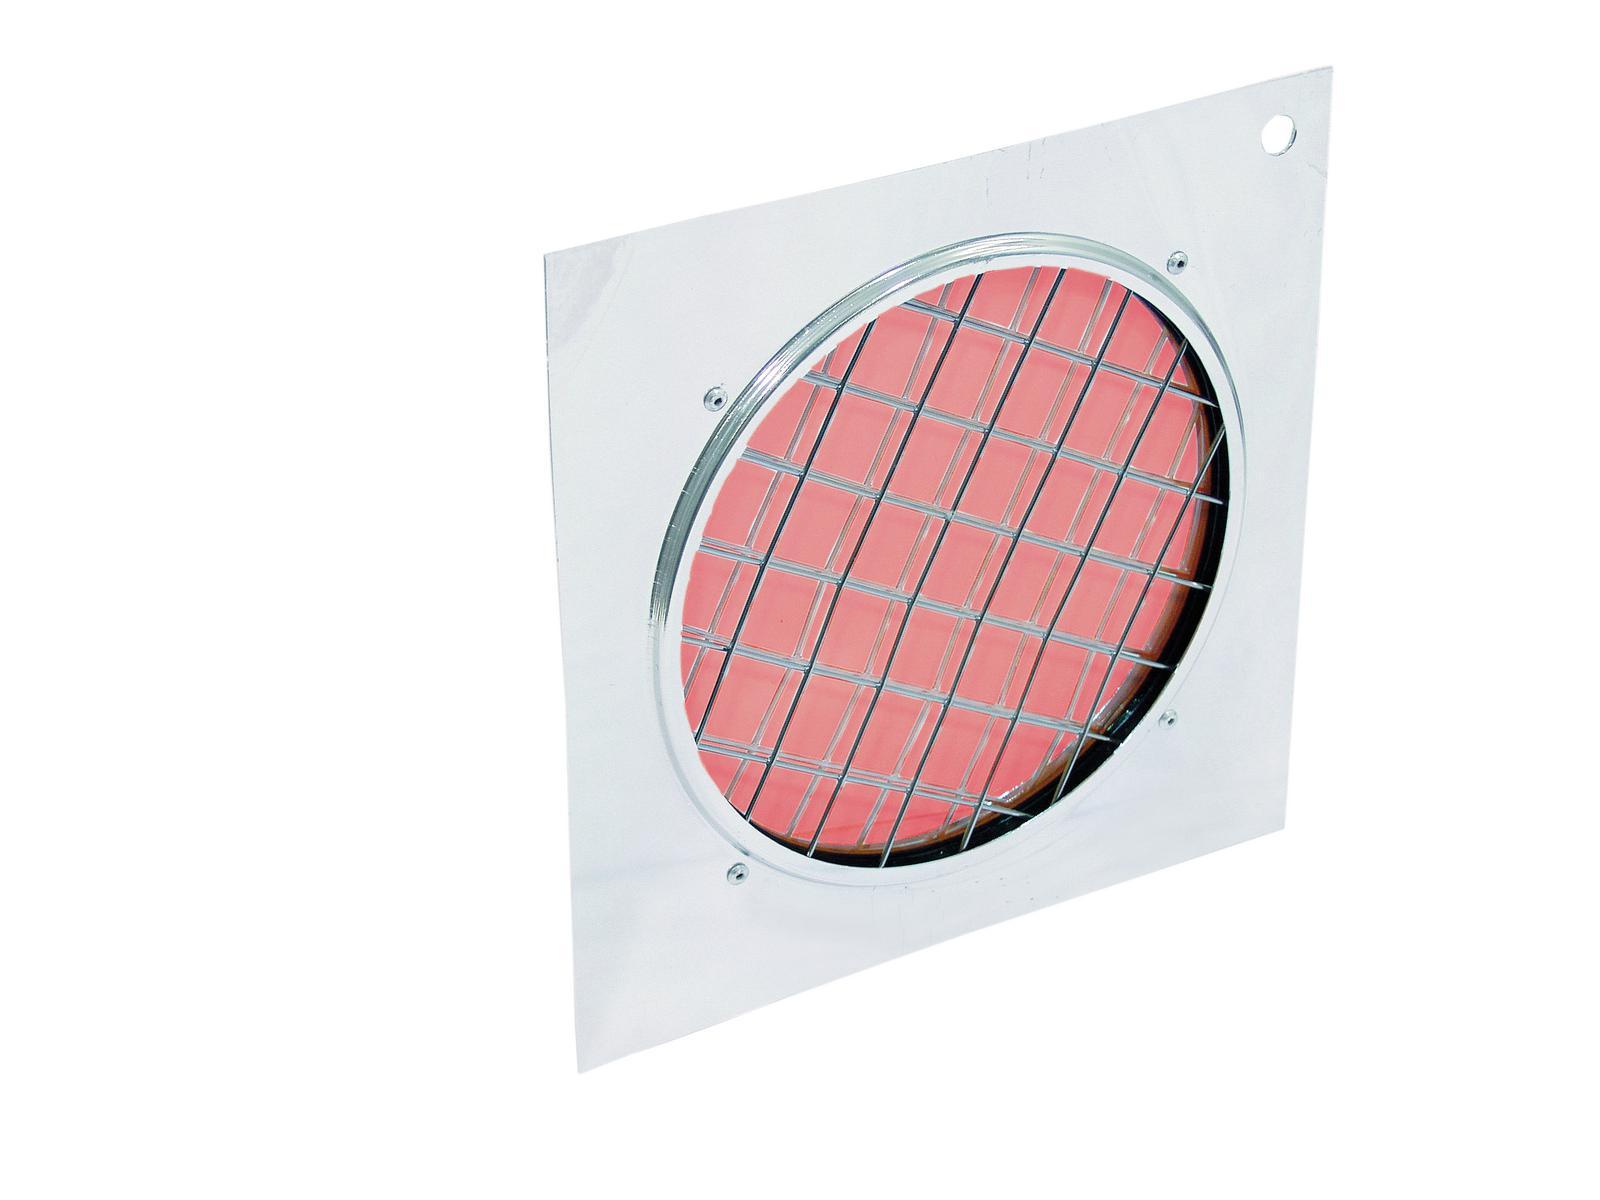 EUROLITE Dichro-Filter rot, Rahmen silber PAR-56